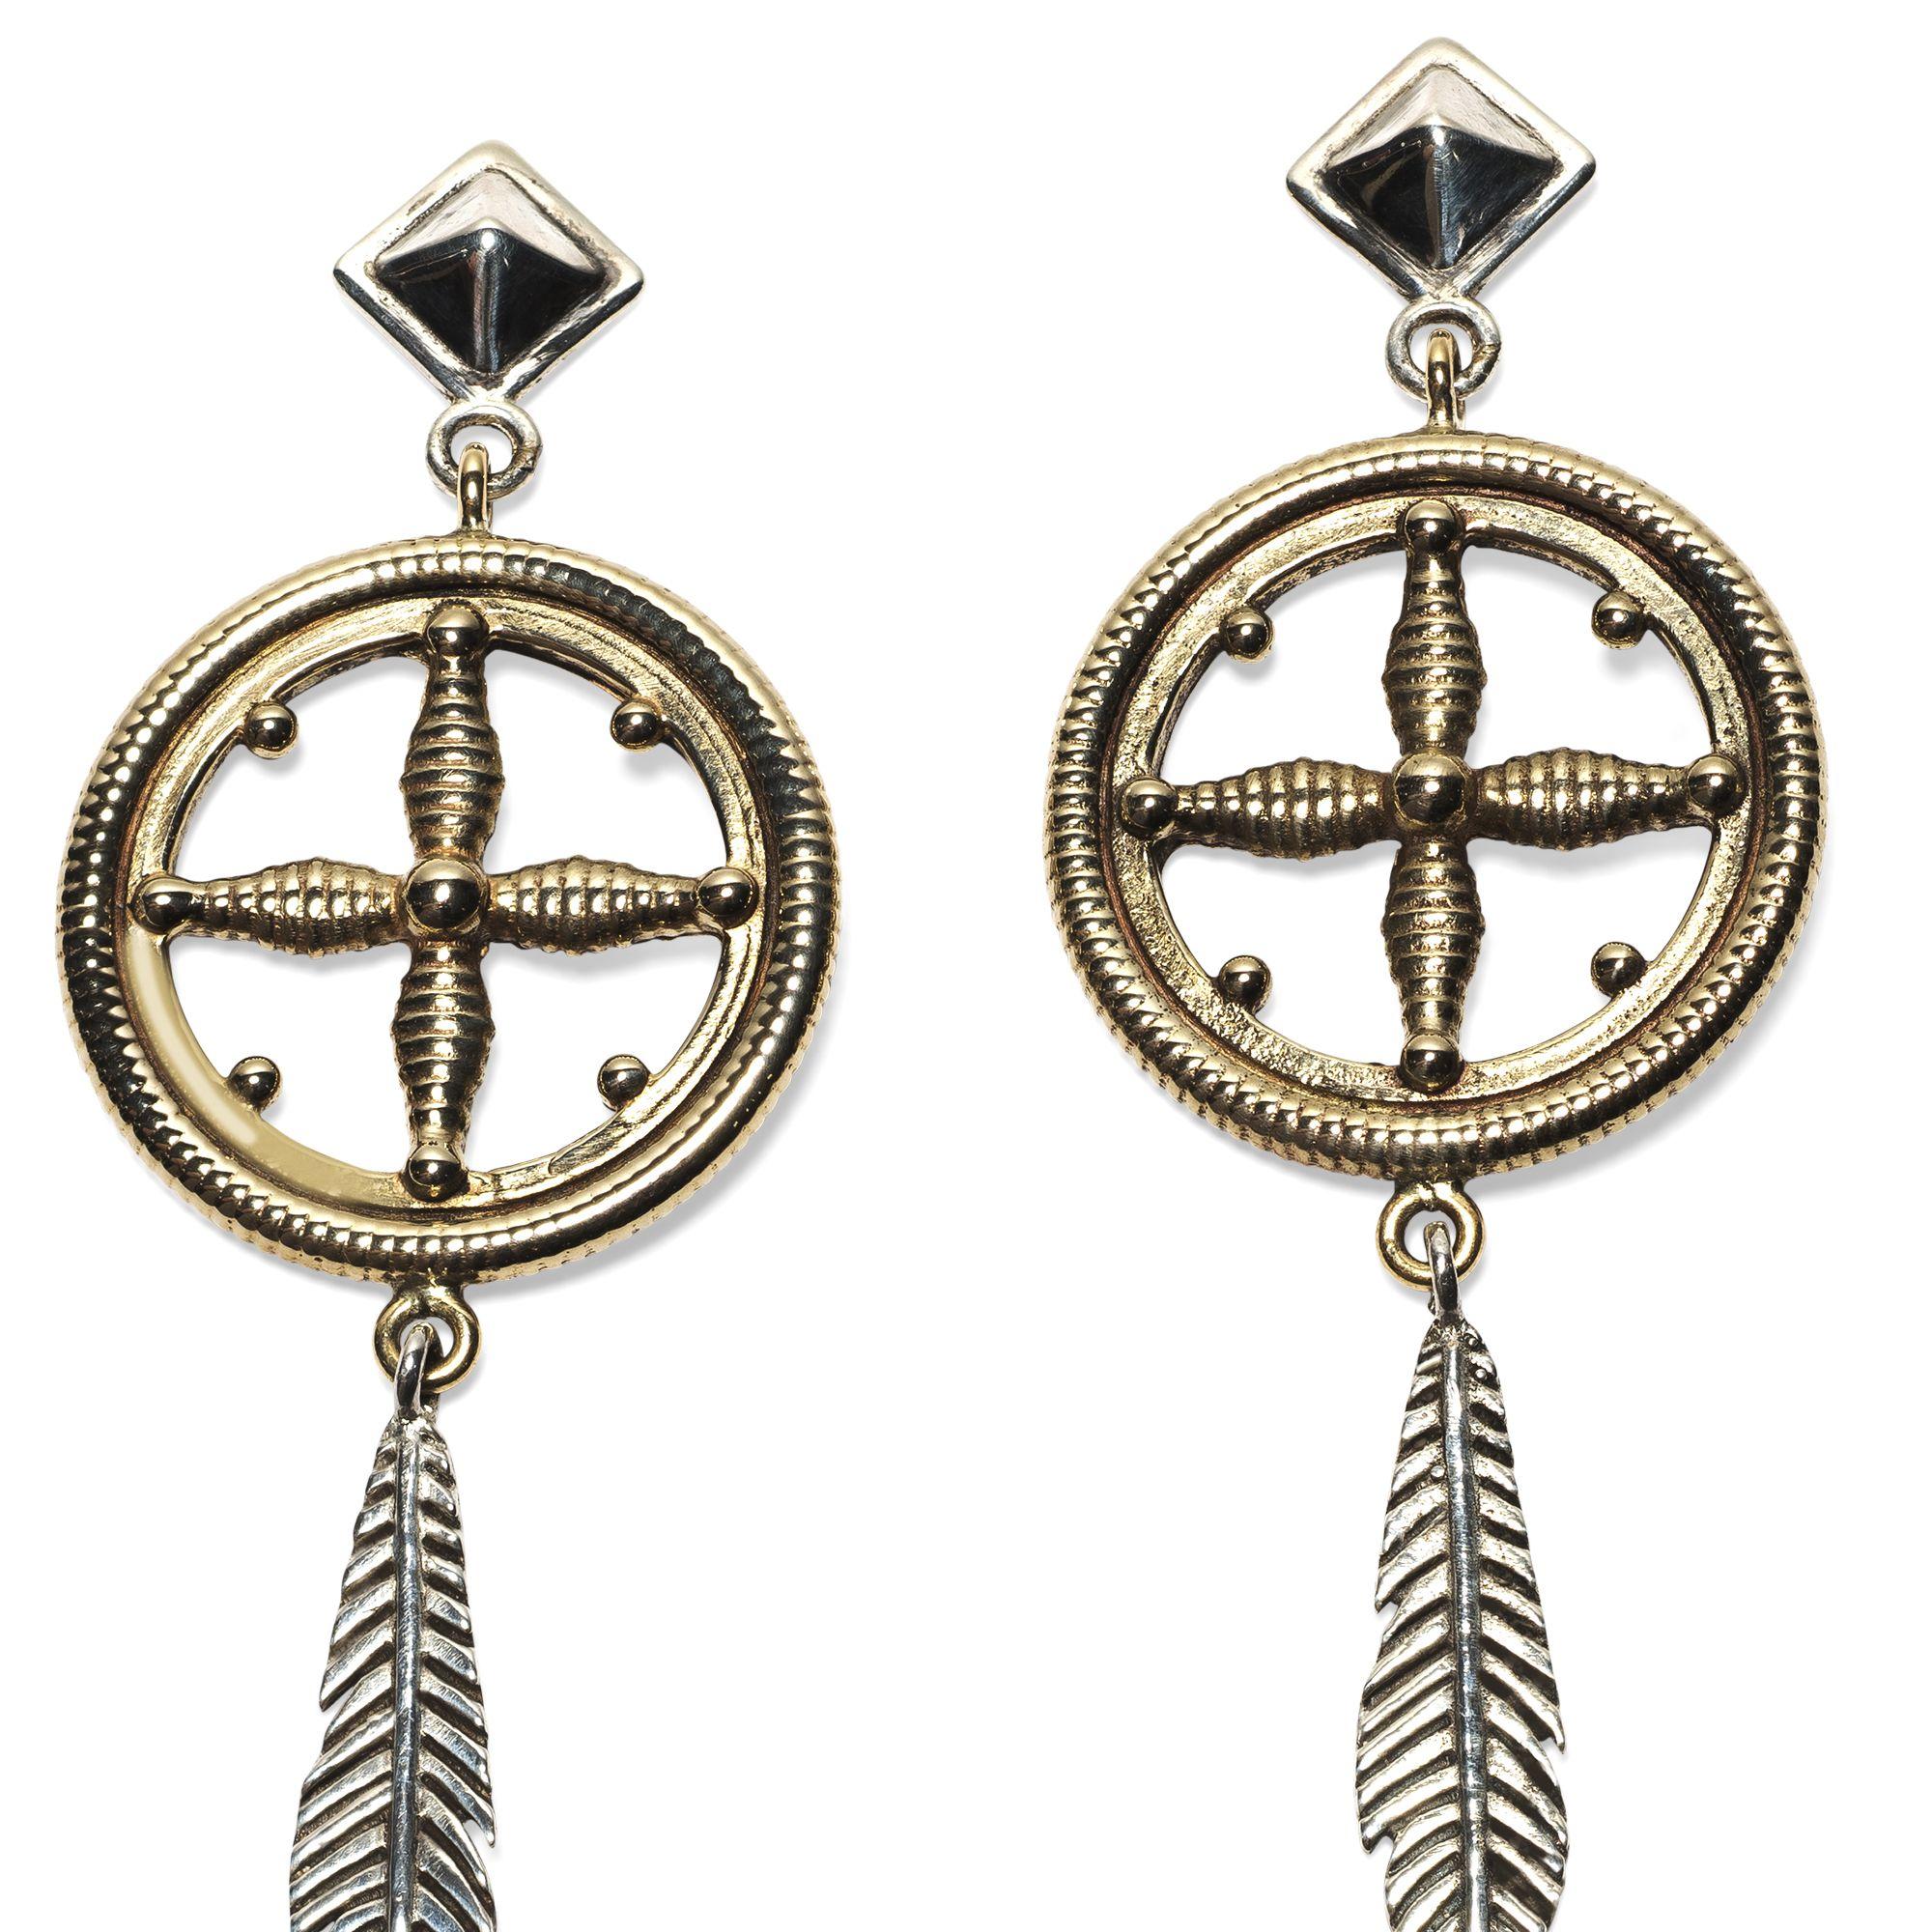 "<p><strong>Pamela Love</strong> earrings, $210, Similar styles available at <a href=""https://shop.harpersbazaar.com"" target=""_blank"">shopBAZAAR.com</a><img src=""http://assets.hdmtools.com/images/HBZ/Shop.svg"" class=""icon shop"">.</p>"